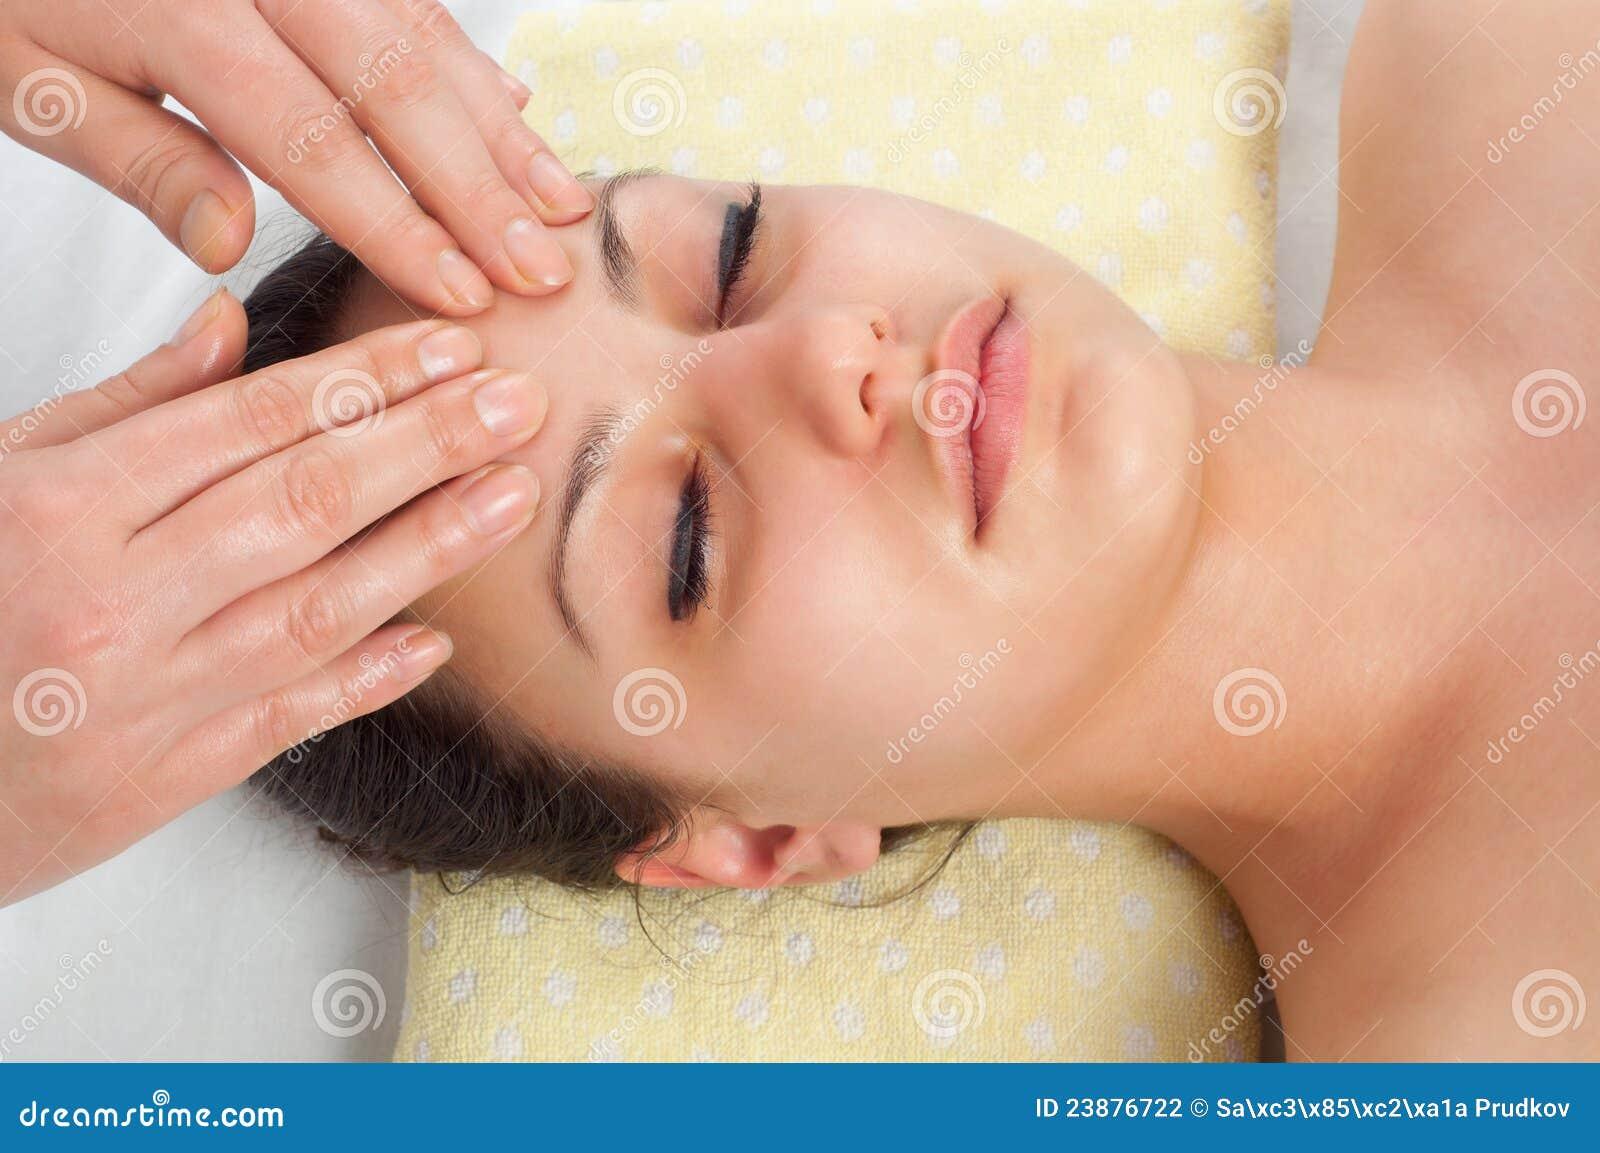 porn sex massage bromma